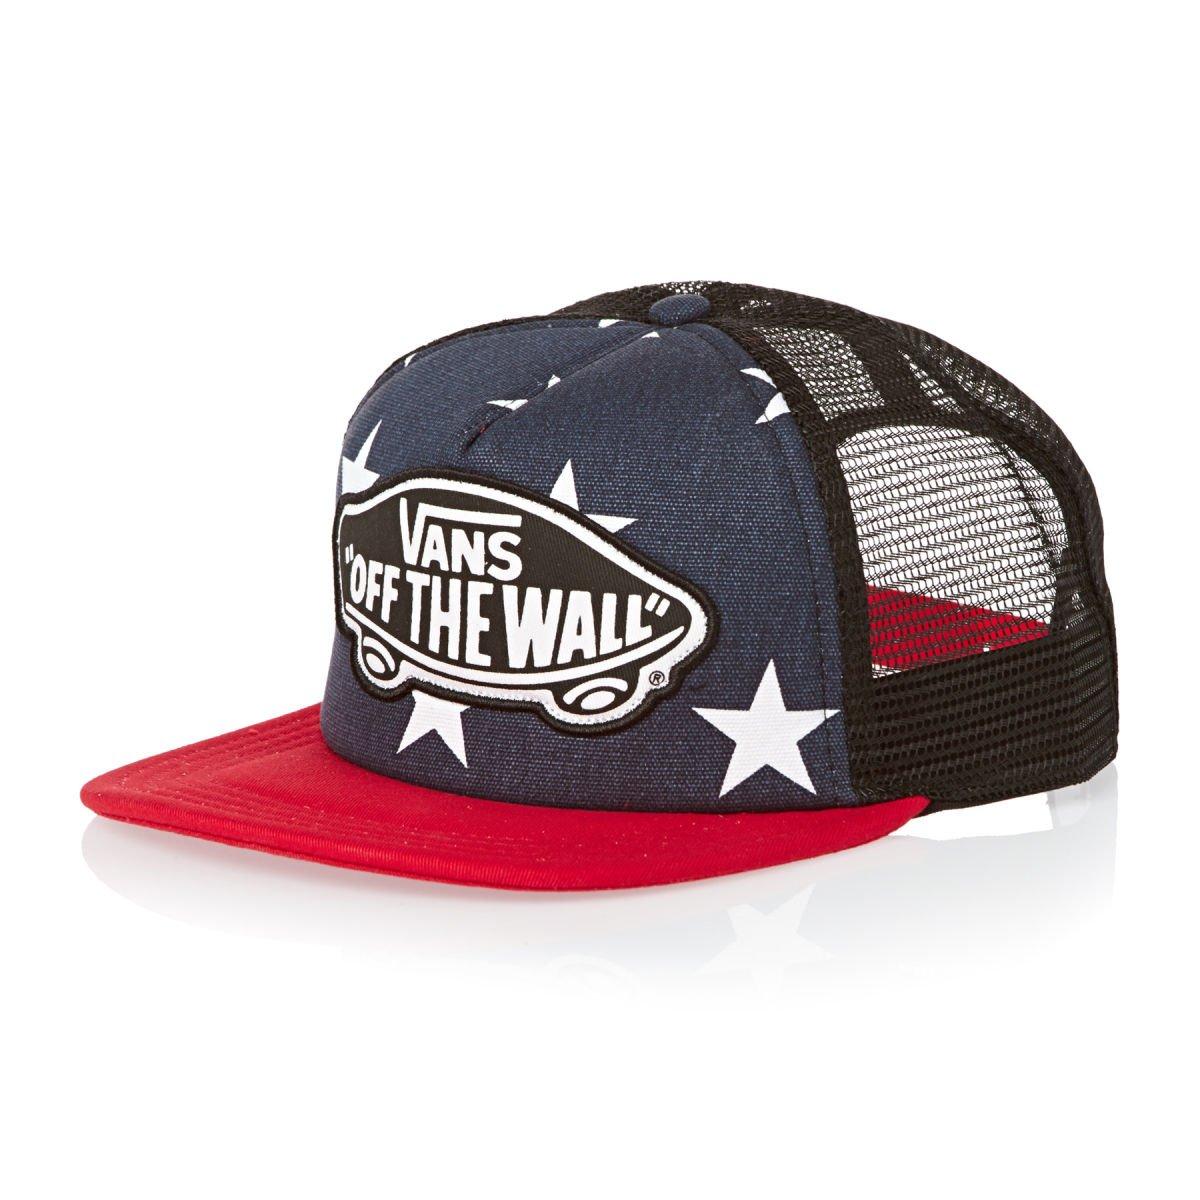 c50ced81ea Amazon.com  Vans Off The Wall Women s Beach Girl Trucker USA Stars Hat Cap  - Peacoat  Clothing